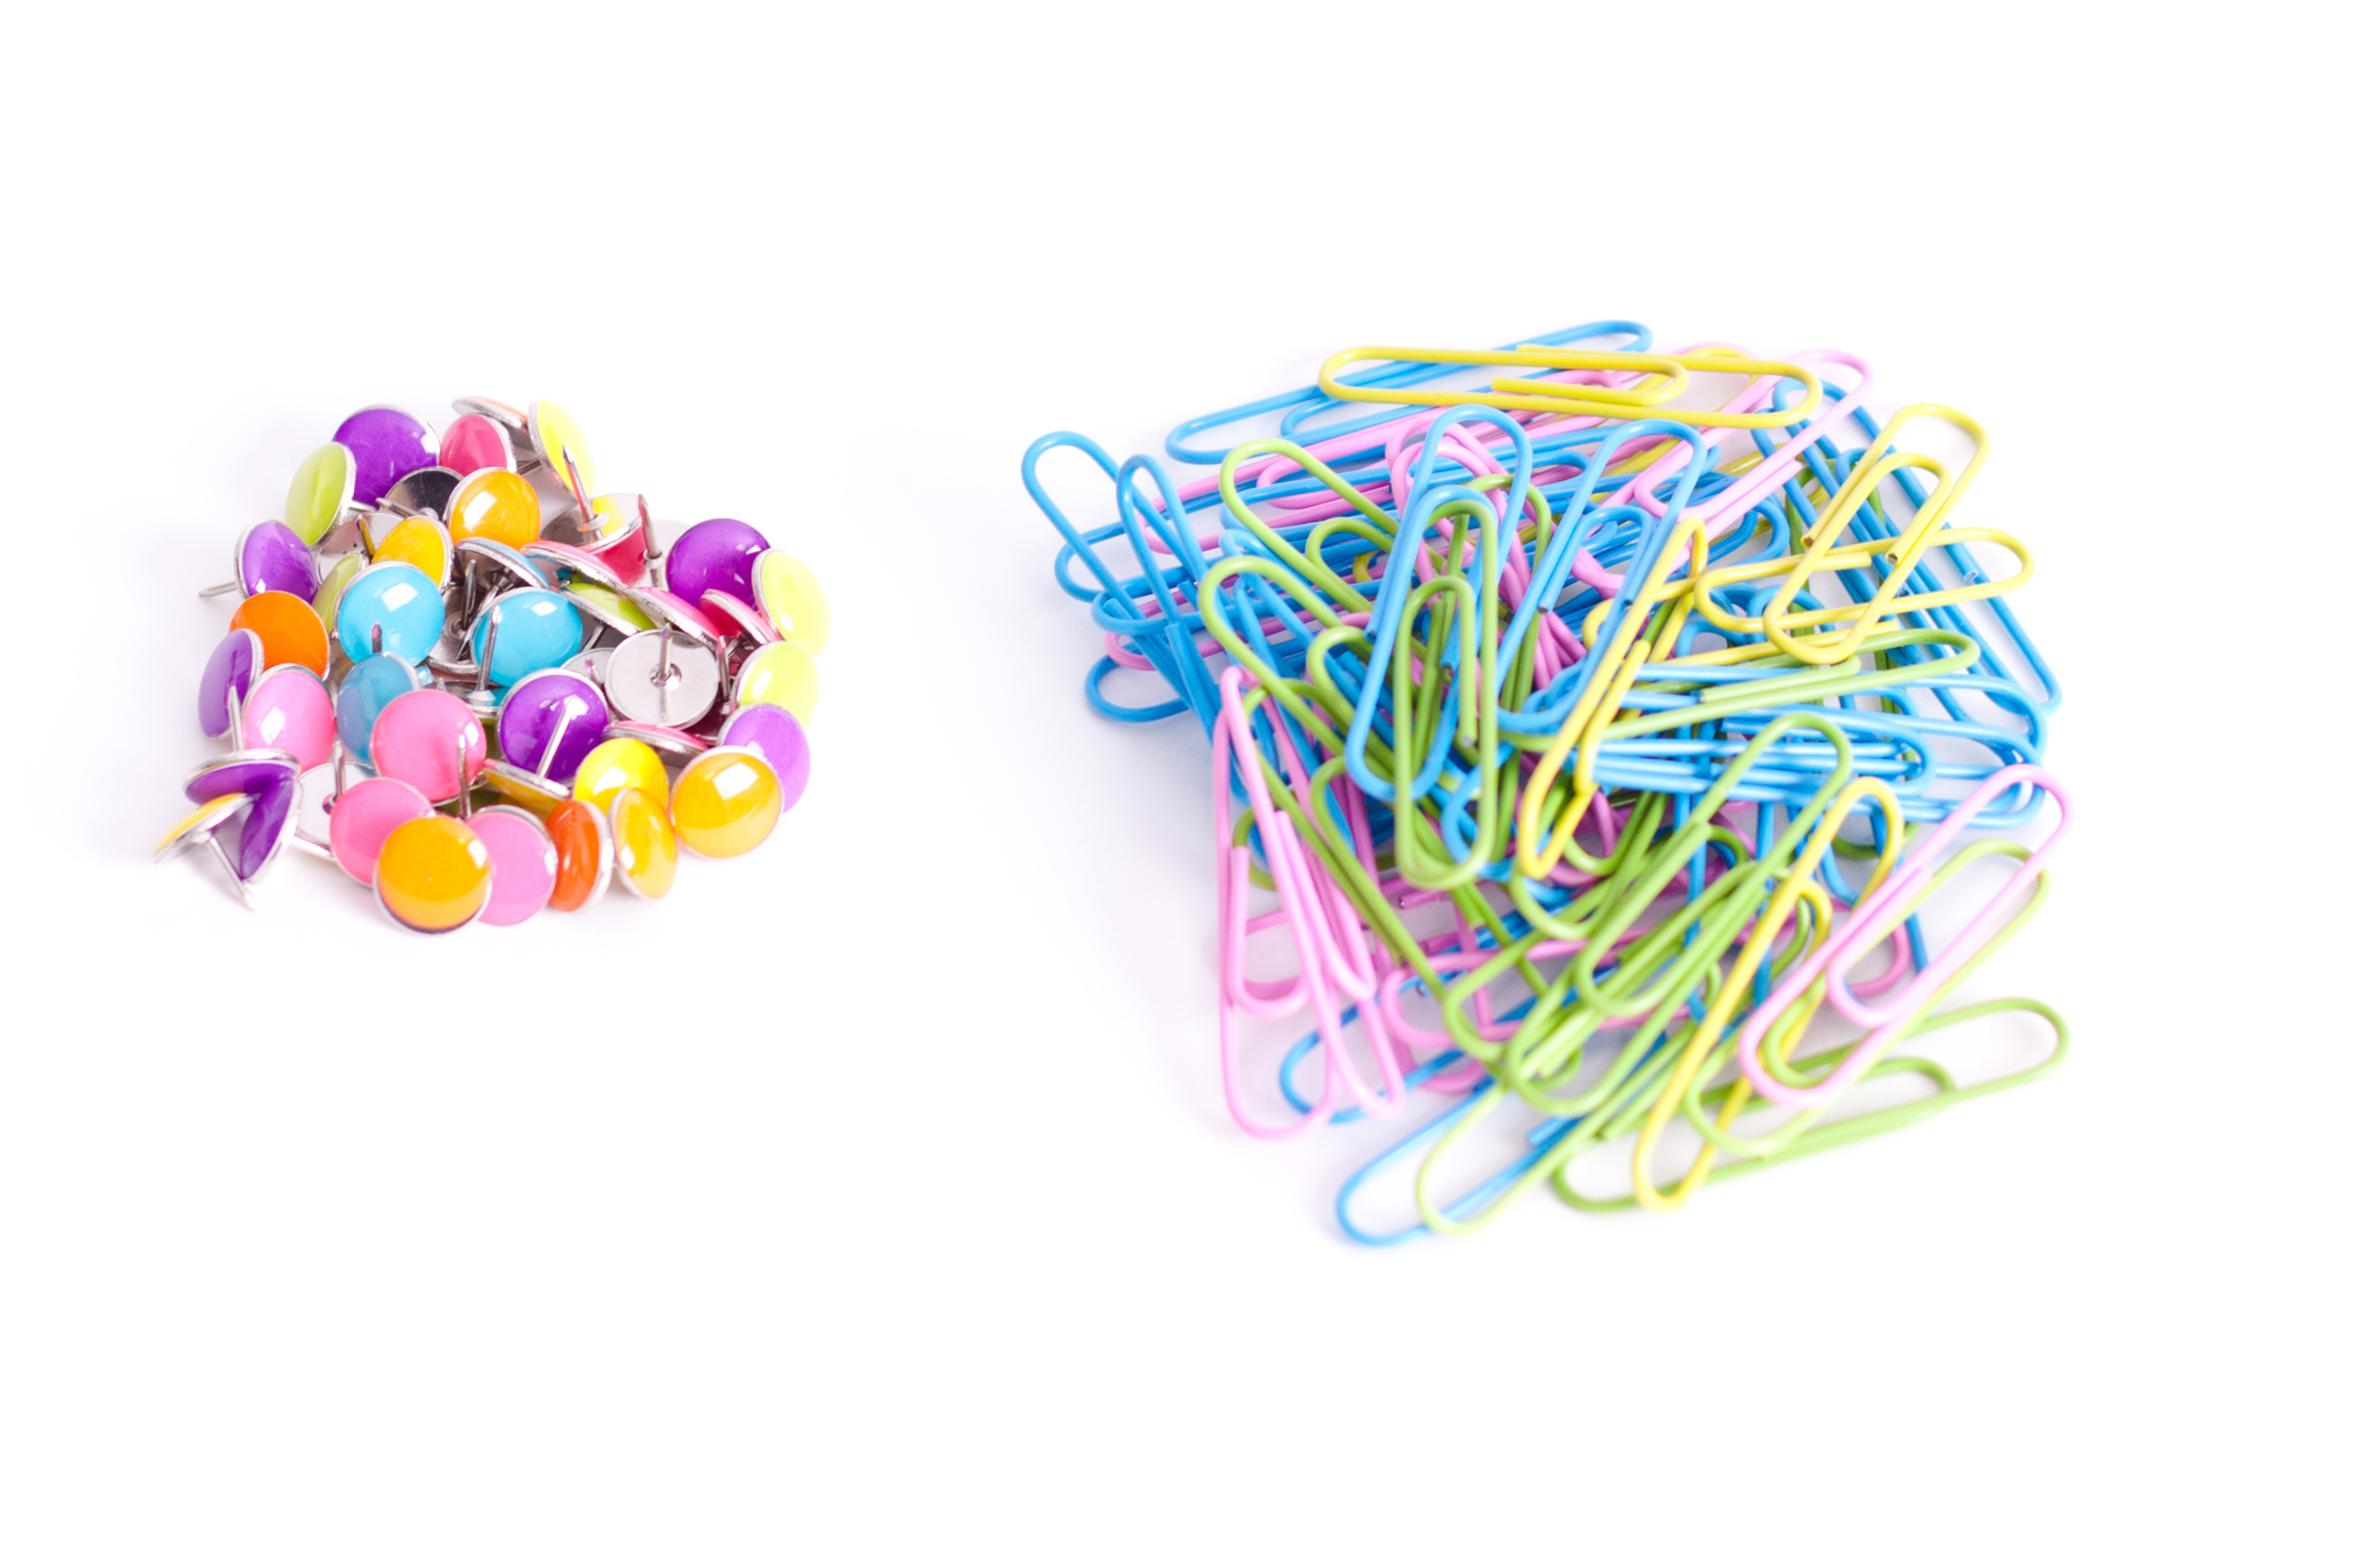 Tacks and paper clips photo